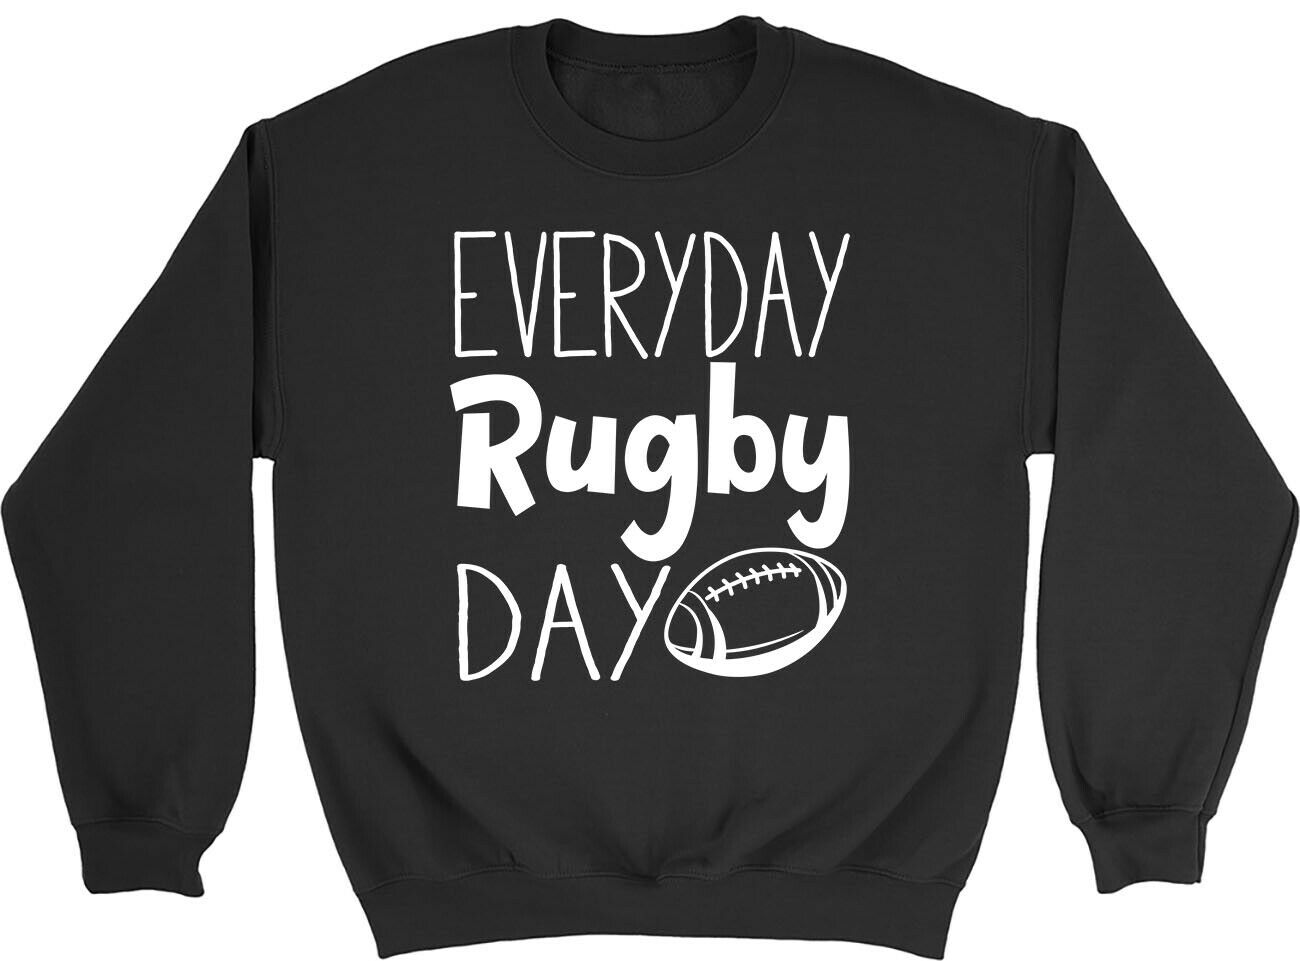 Everyday Rugby Day Mens Womens Sweatshirt Jumper